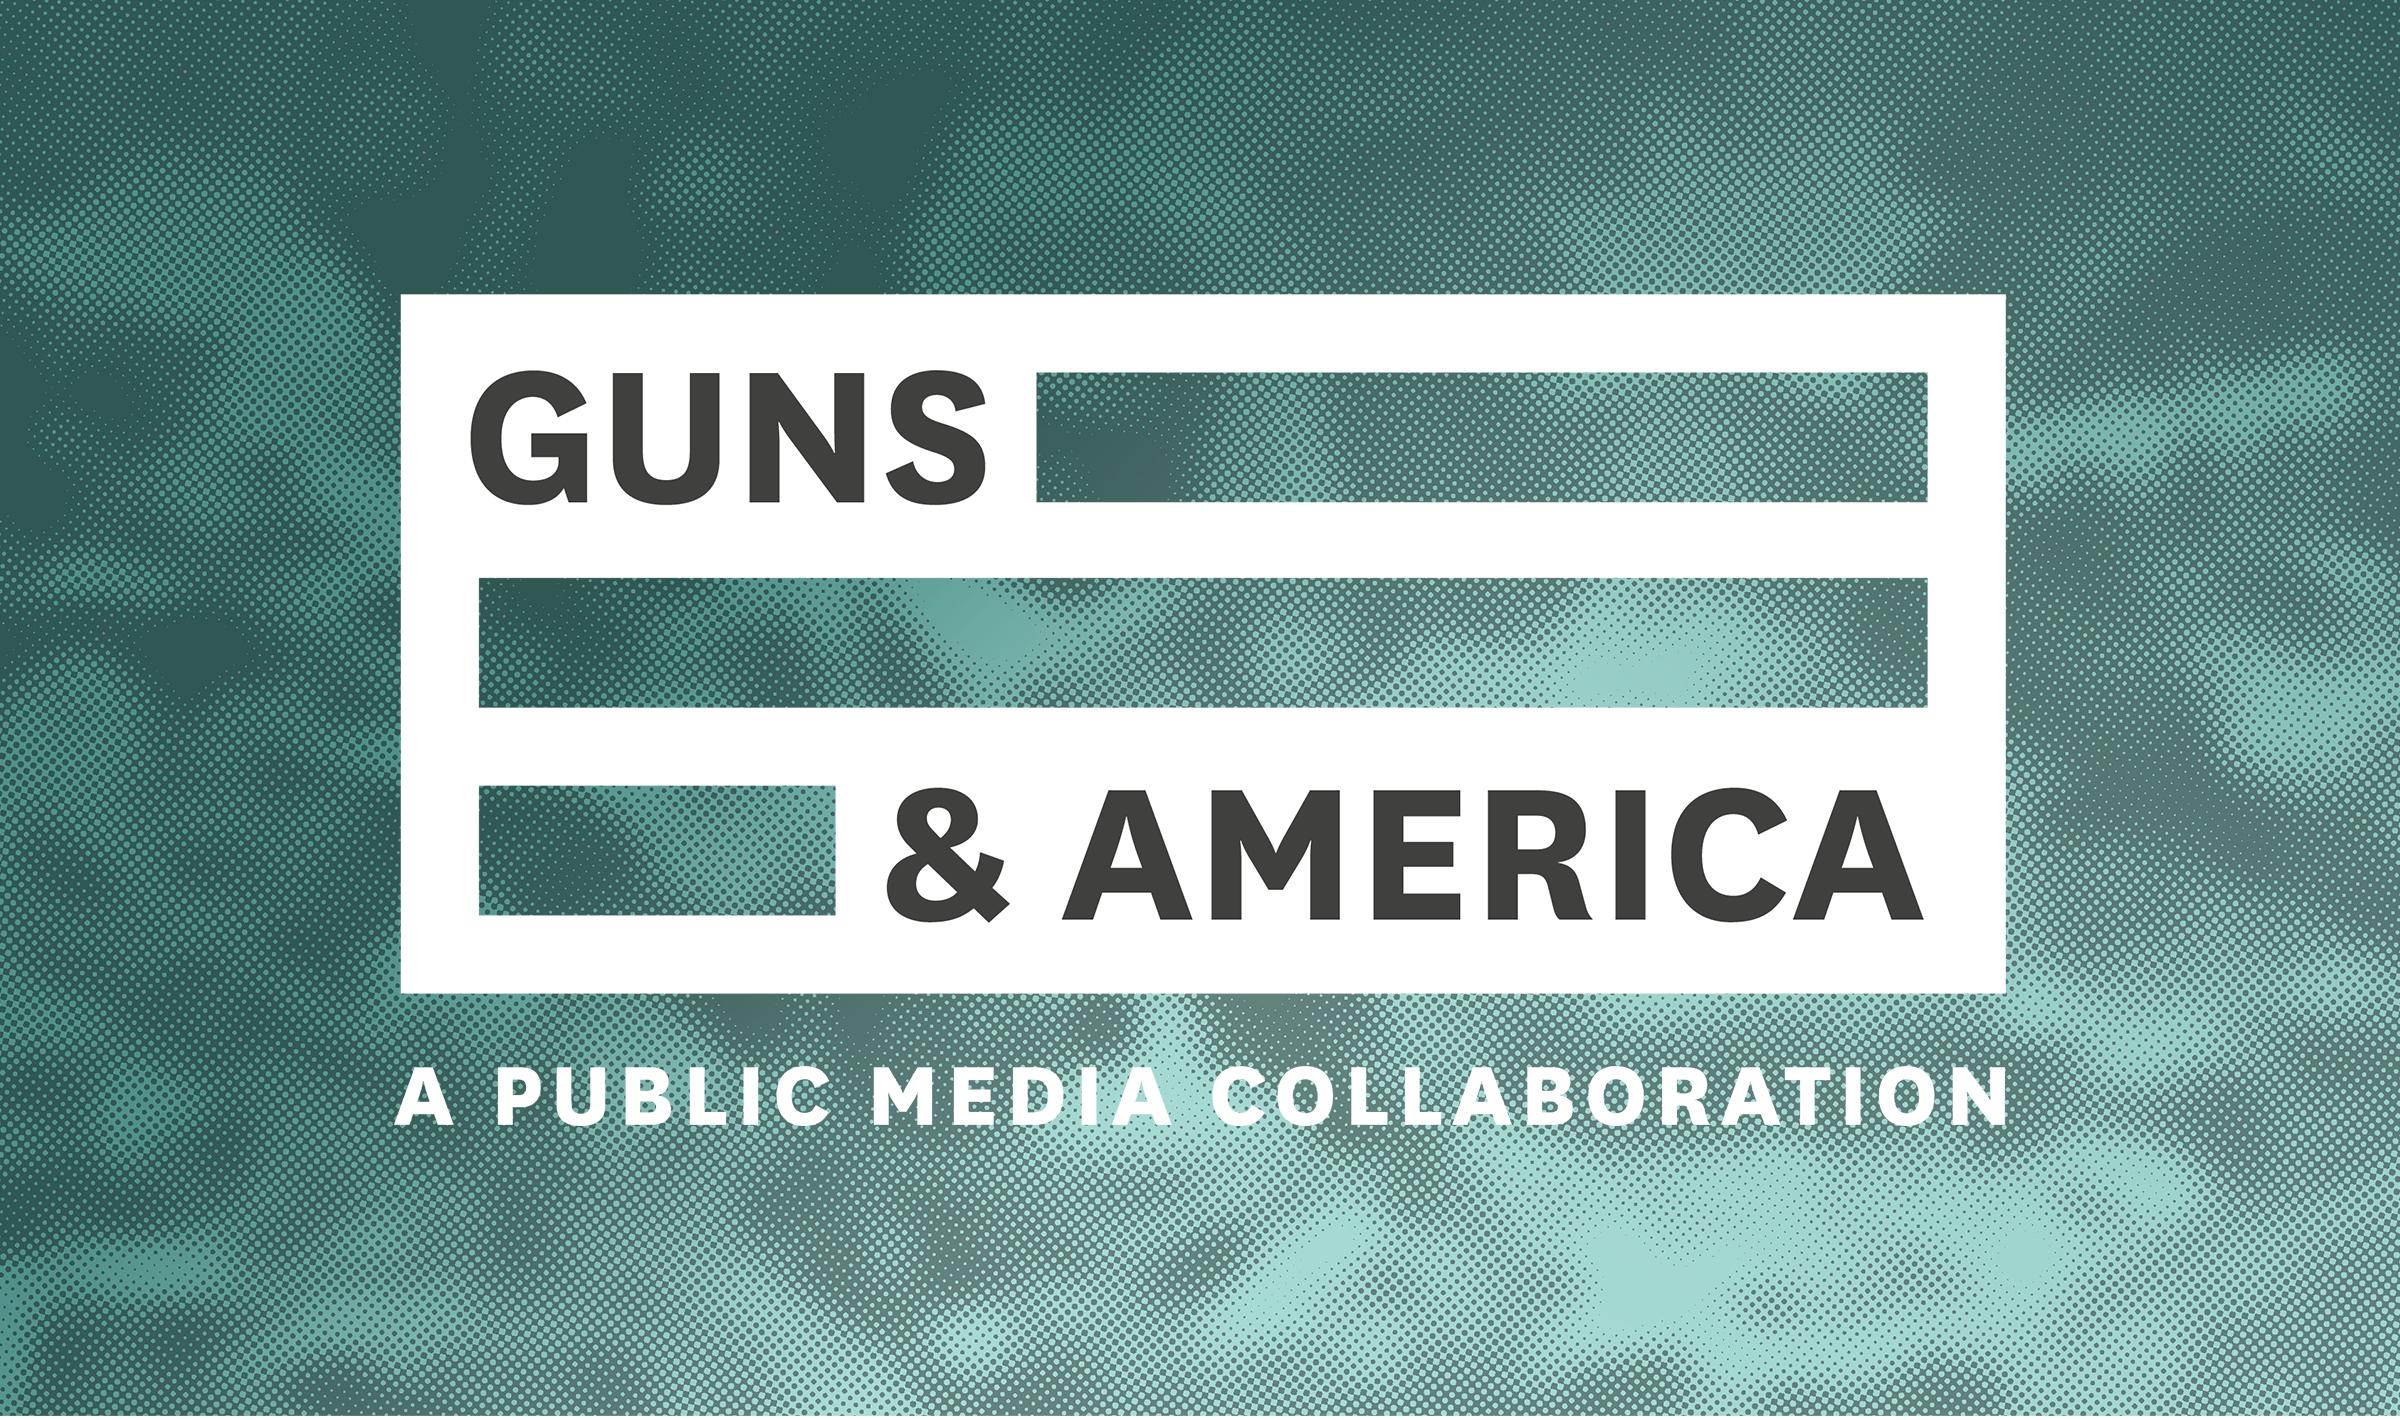 Guns & America.png